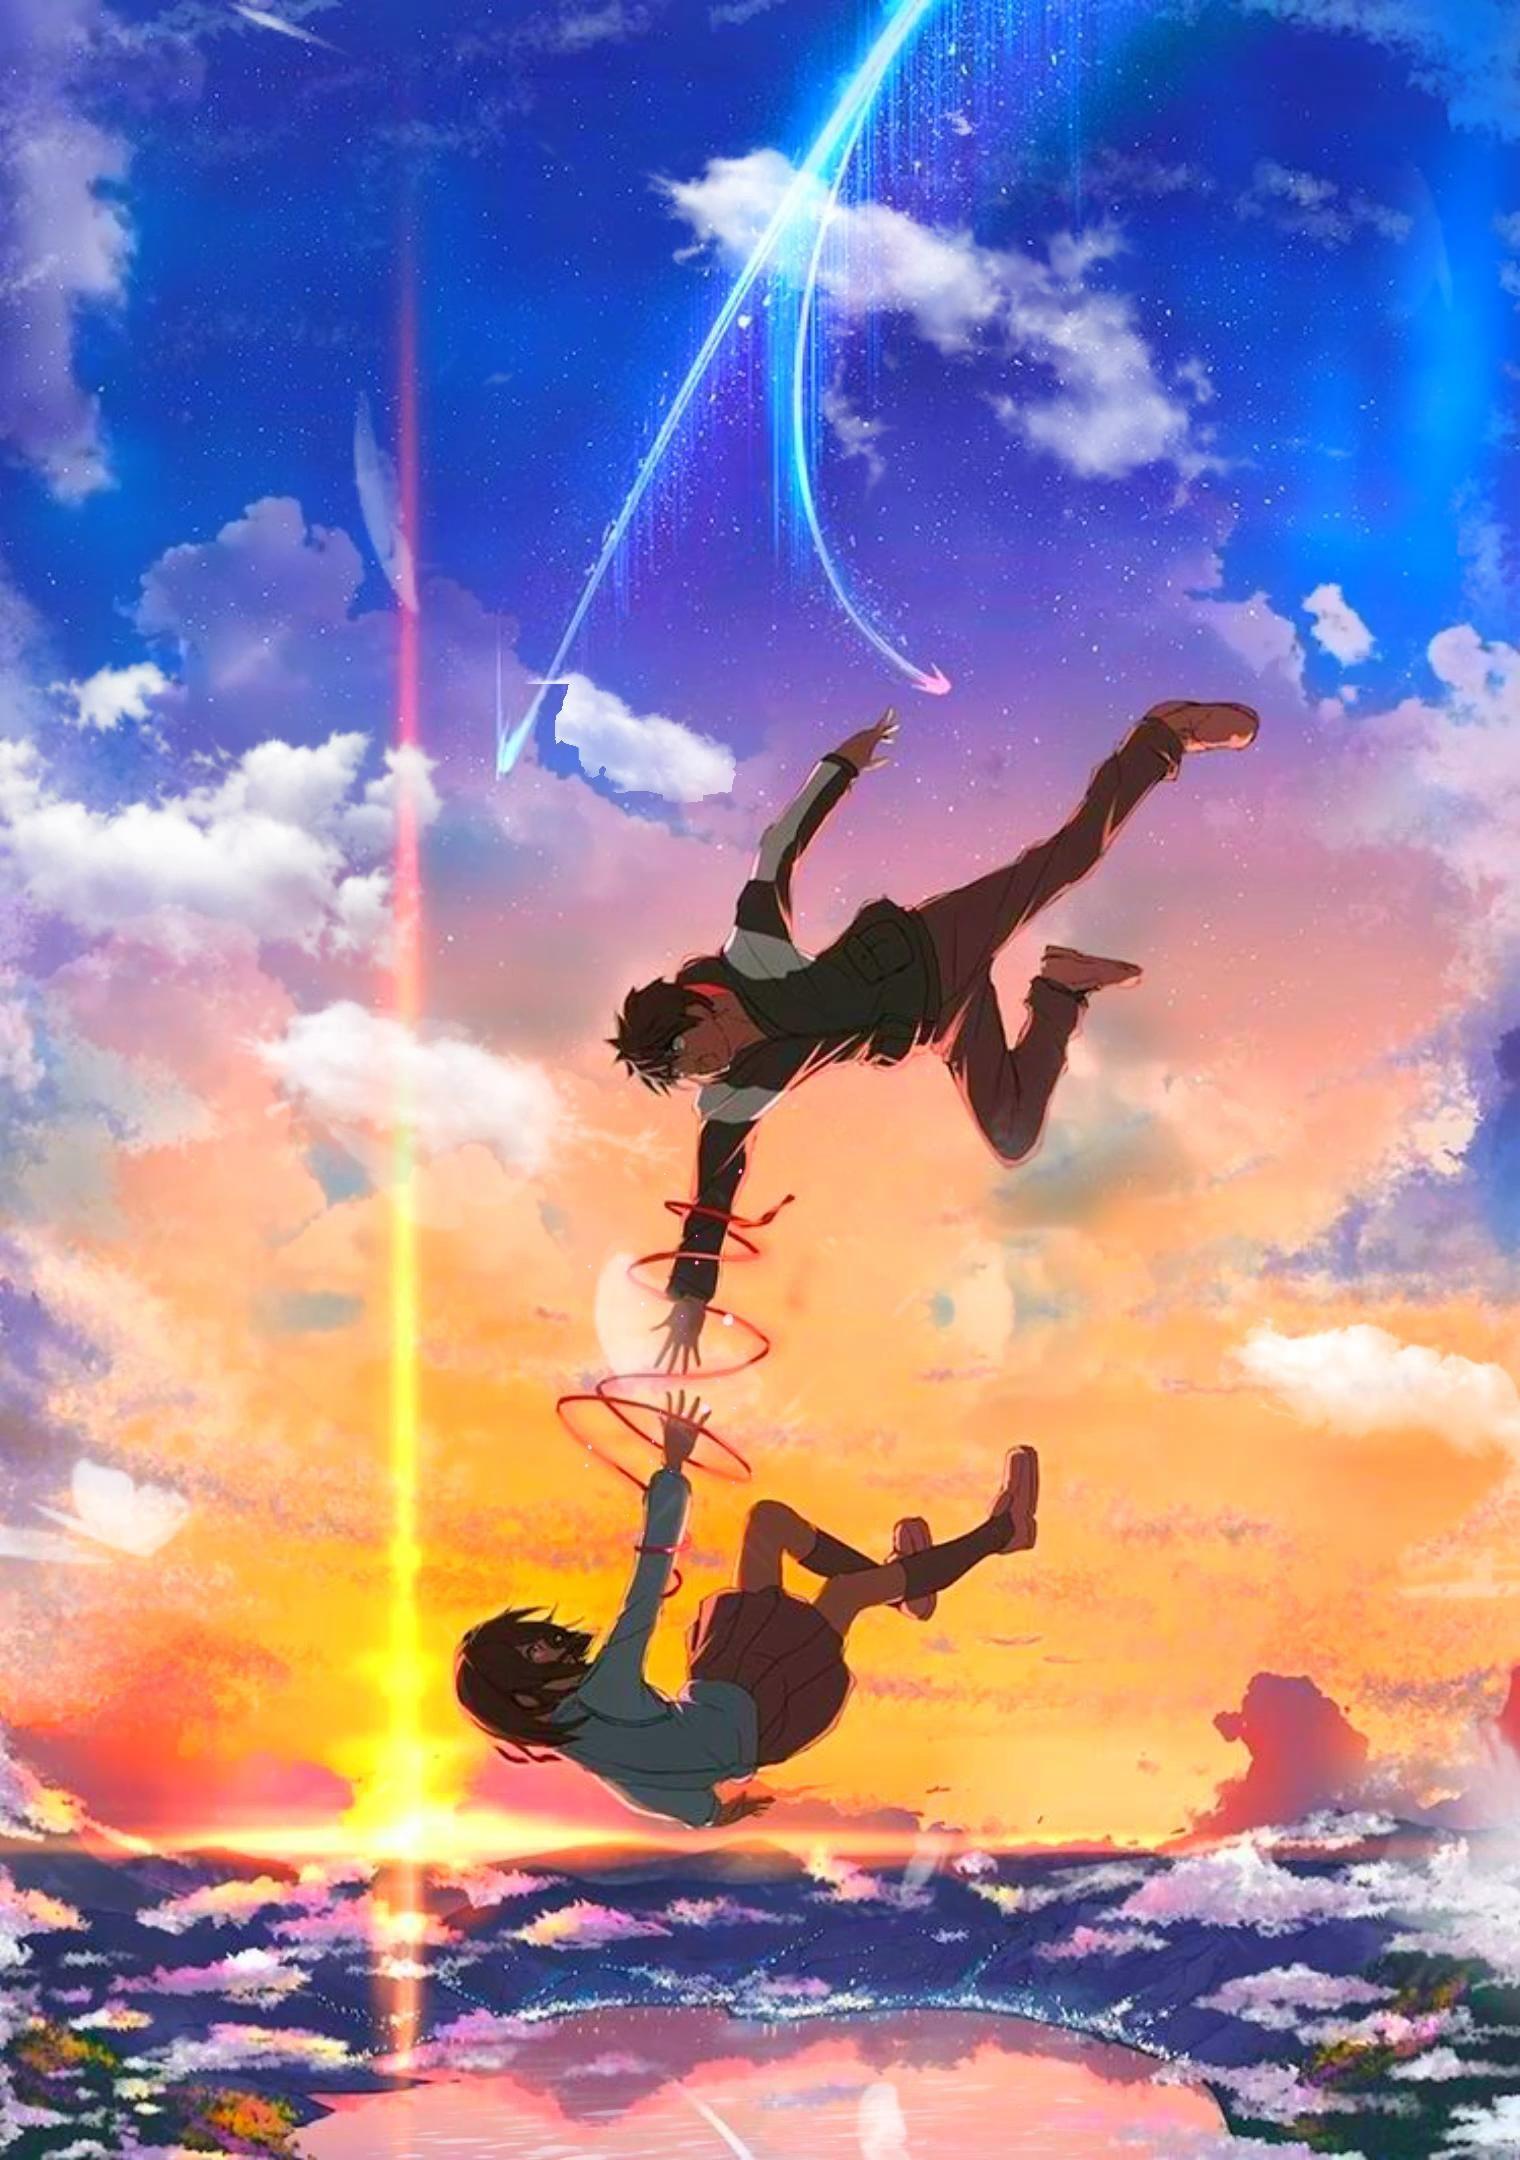 Your Name Animated Wallpaper Video Anime Music Anime Anime Scenery